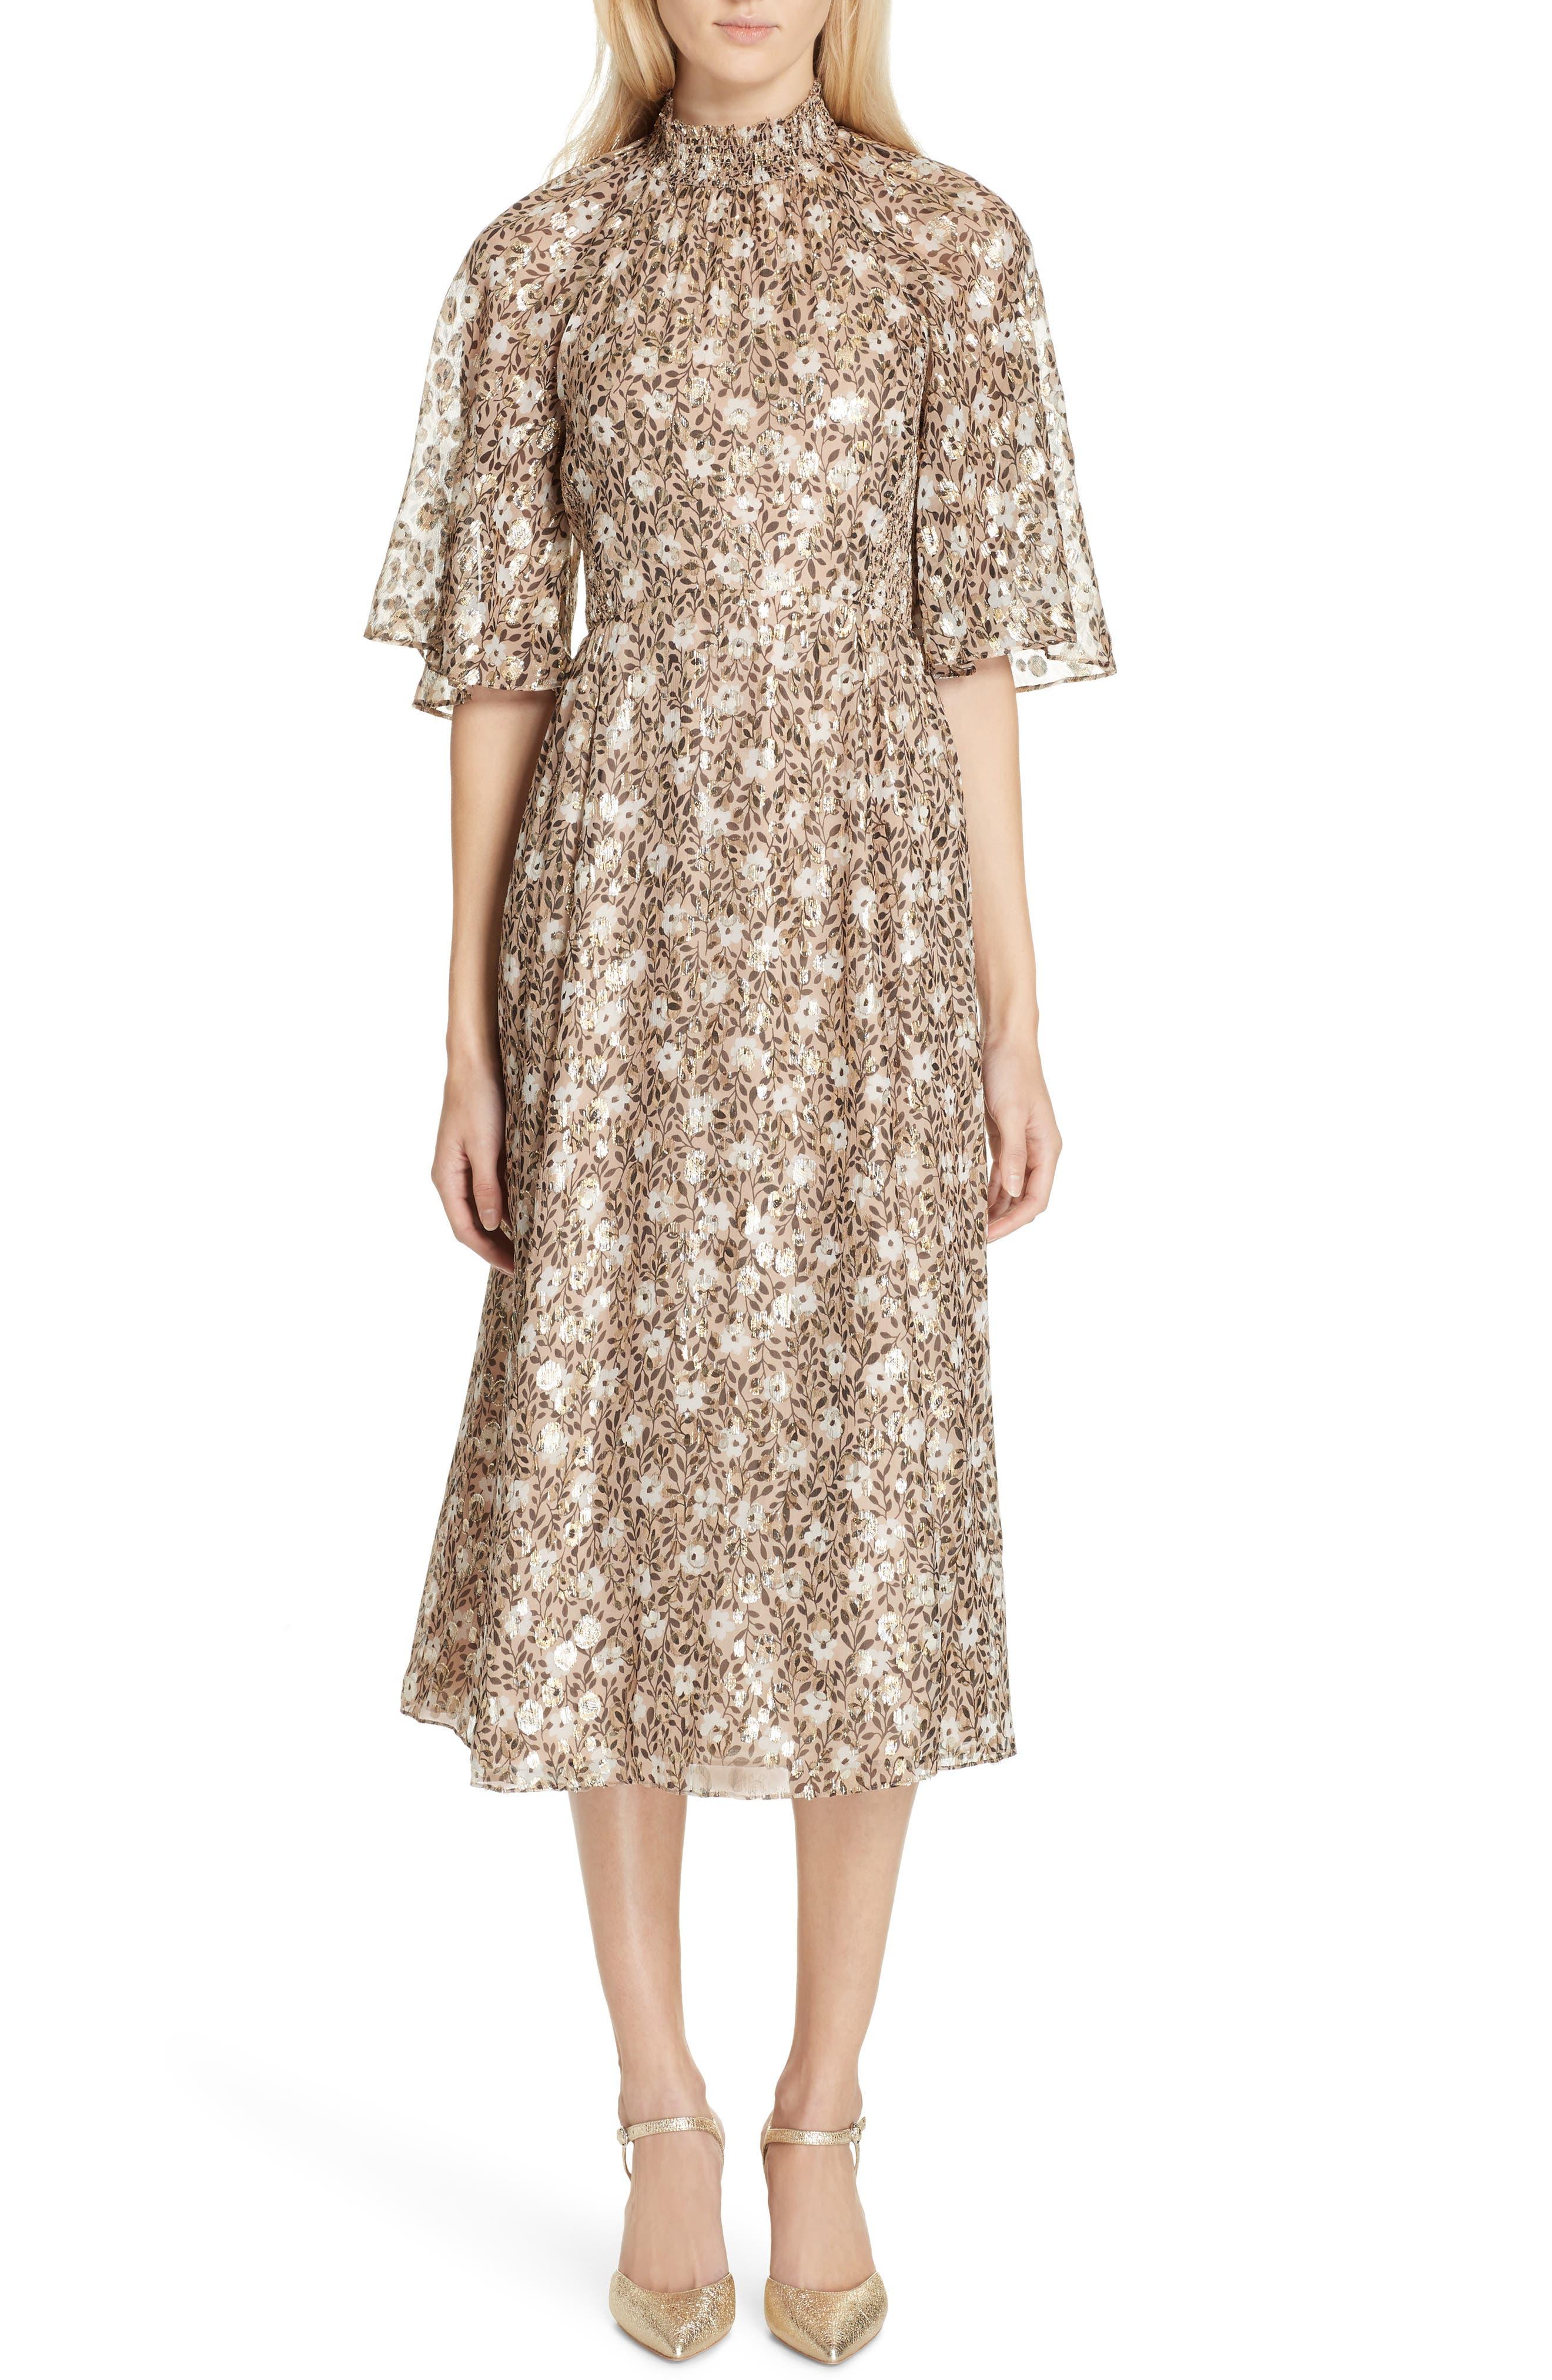 Kate Spade New York Floral Park Metallic Detail Silk Blend Midi Dress